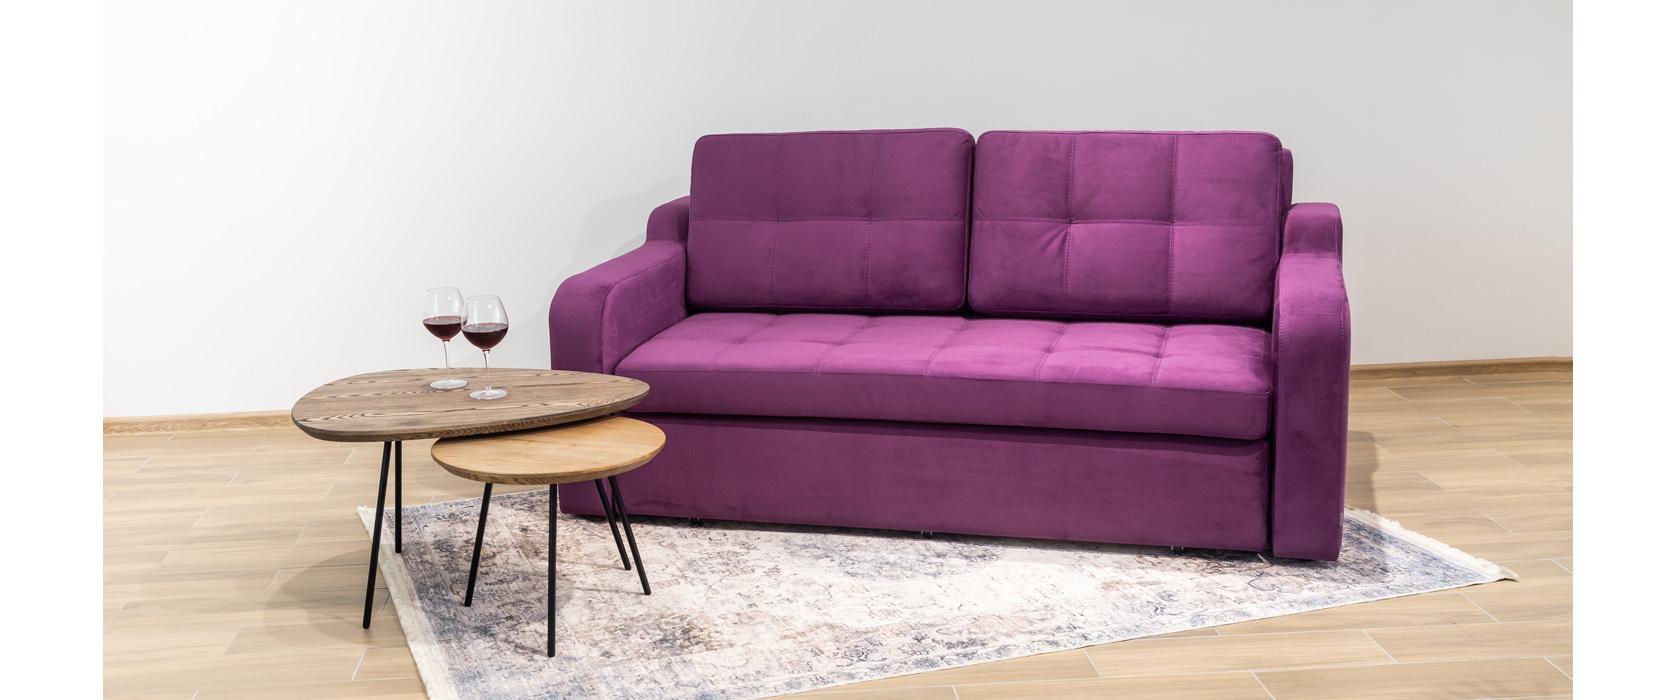 Трехместный диван Vito - Фото 1 - Pufetto